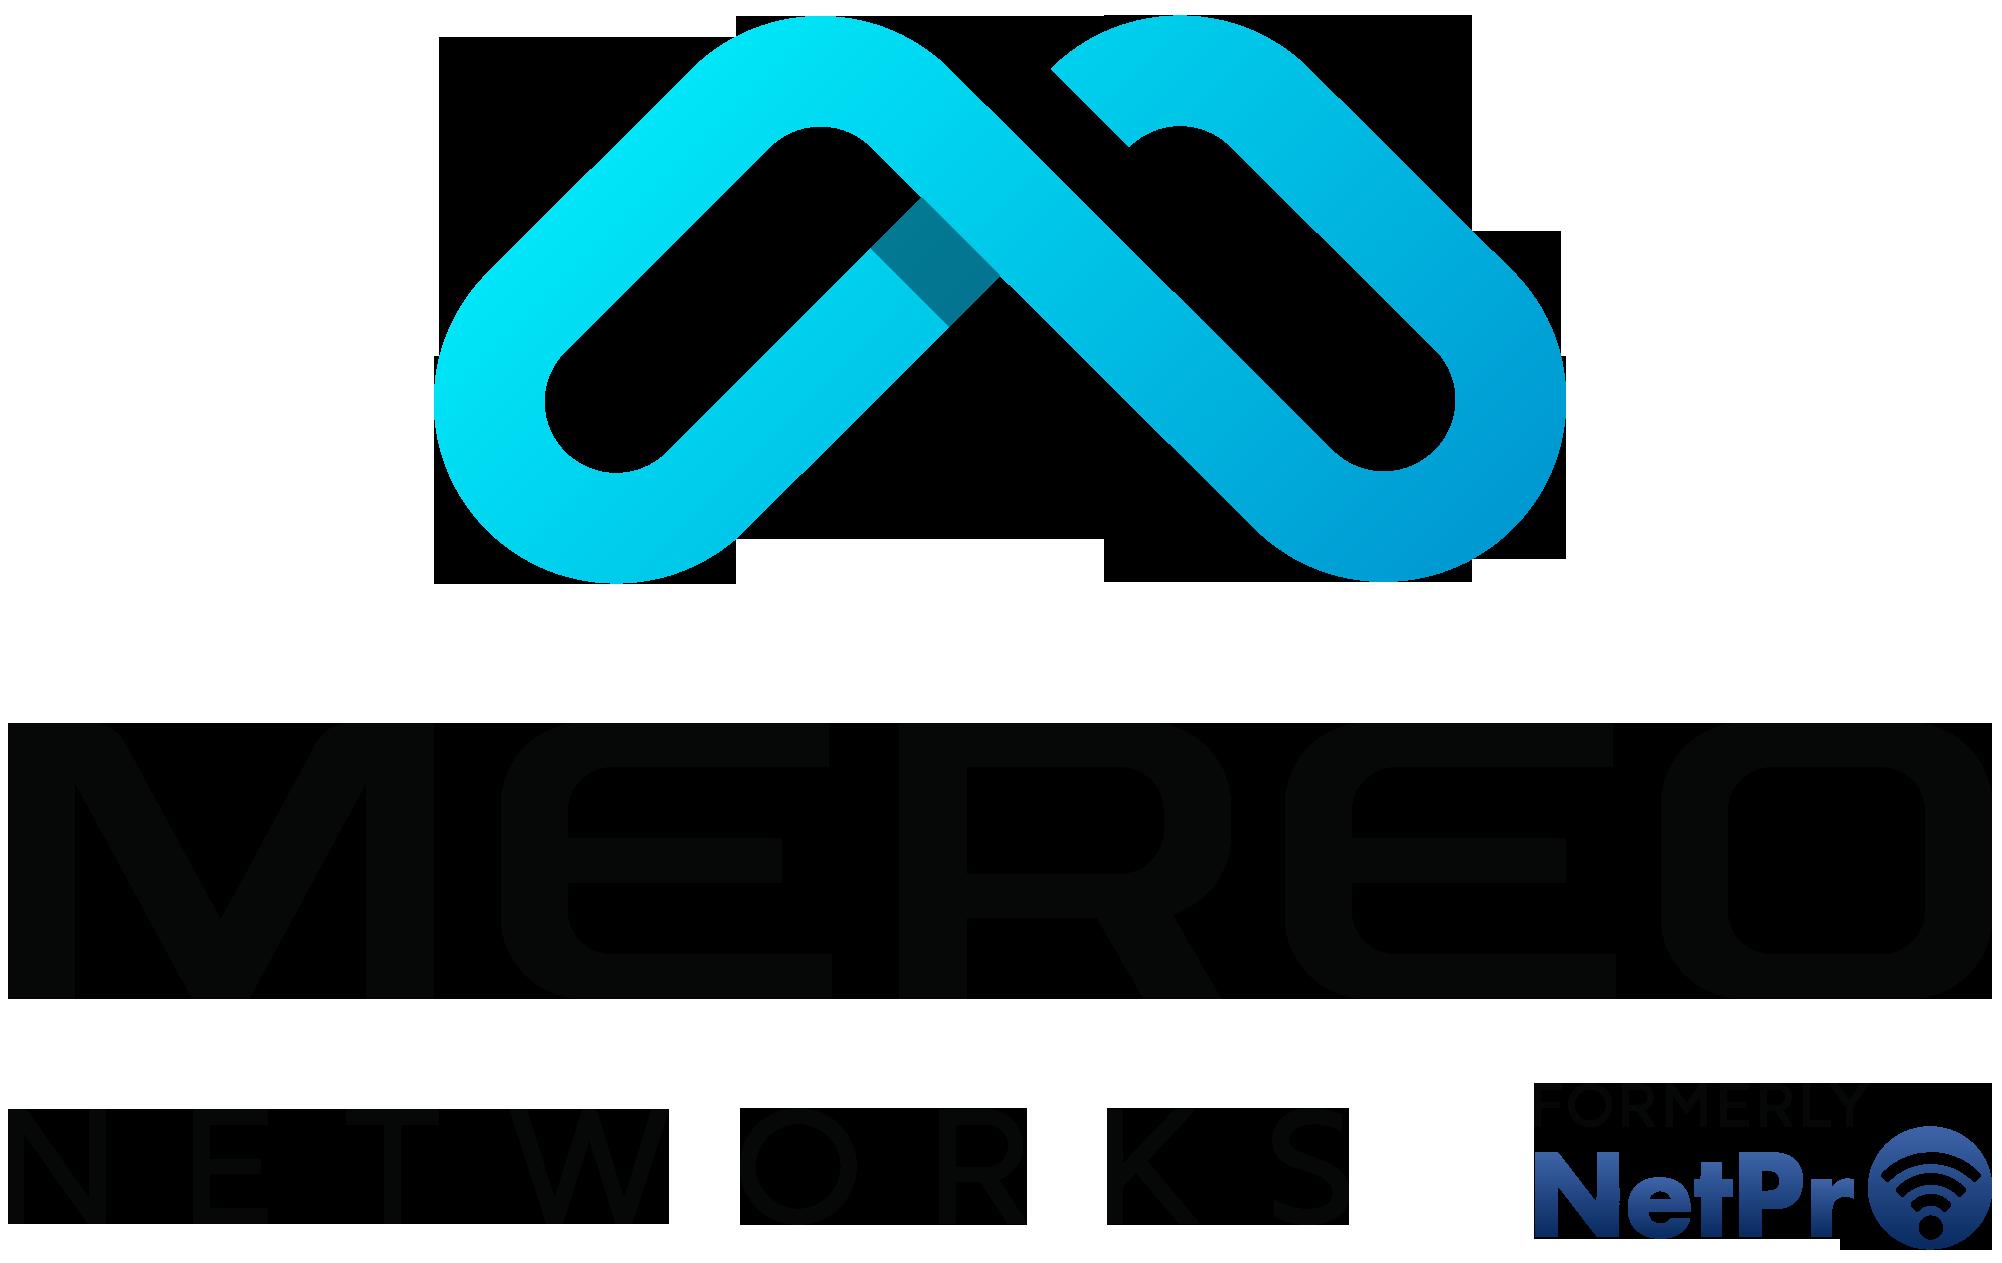 NetPro Networks, LLC. Announces Company Name Change and ...